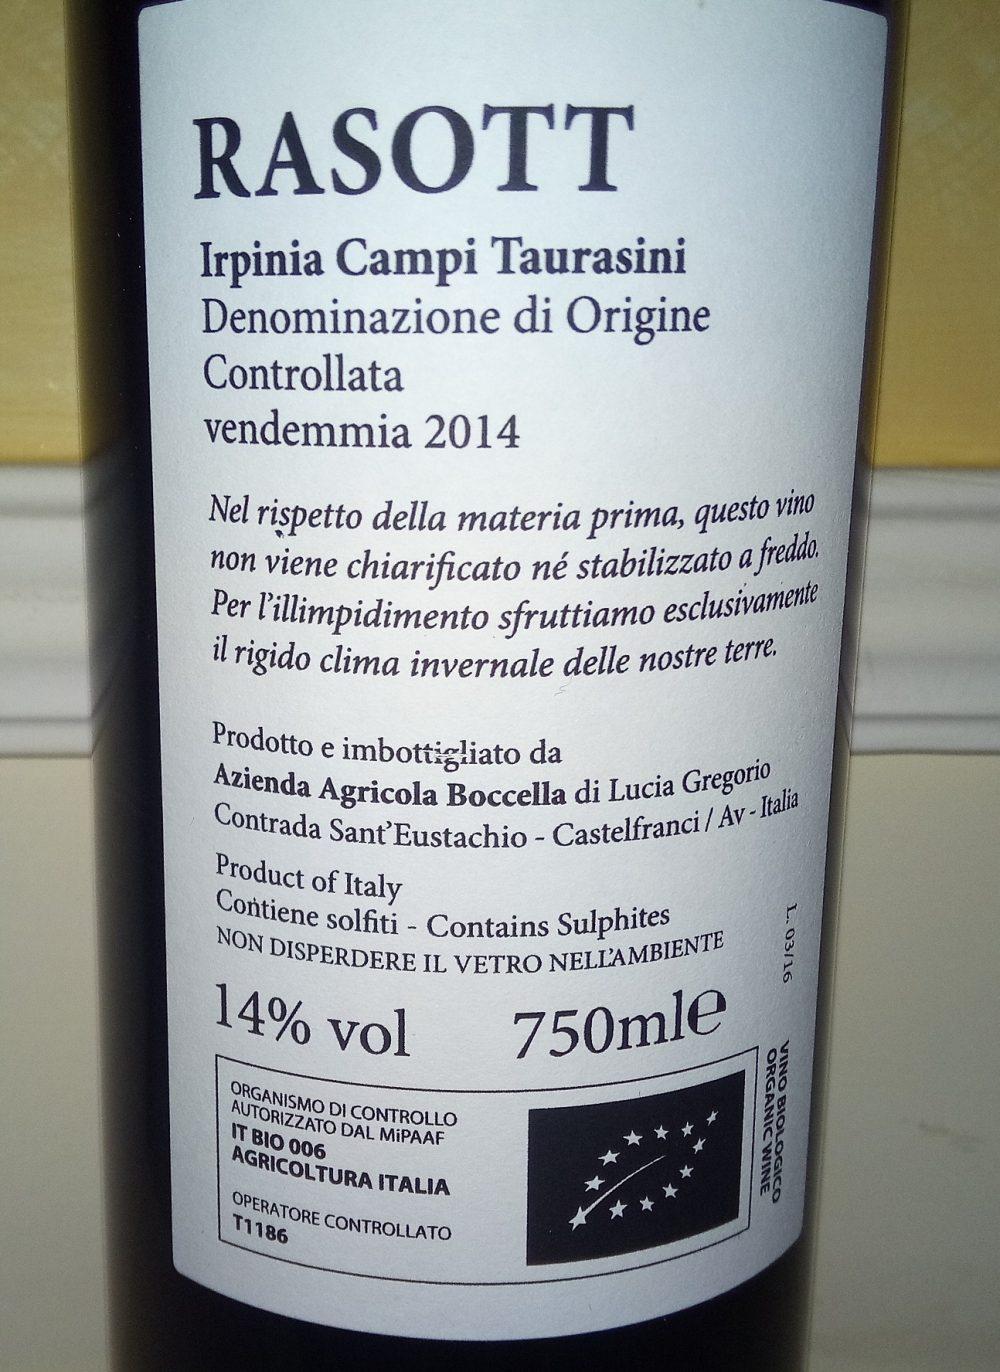 Controetichetta Rasott Irpinia Campi Taurasini Doc 2014 Boccella